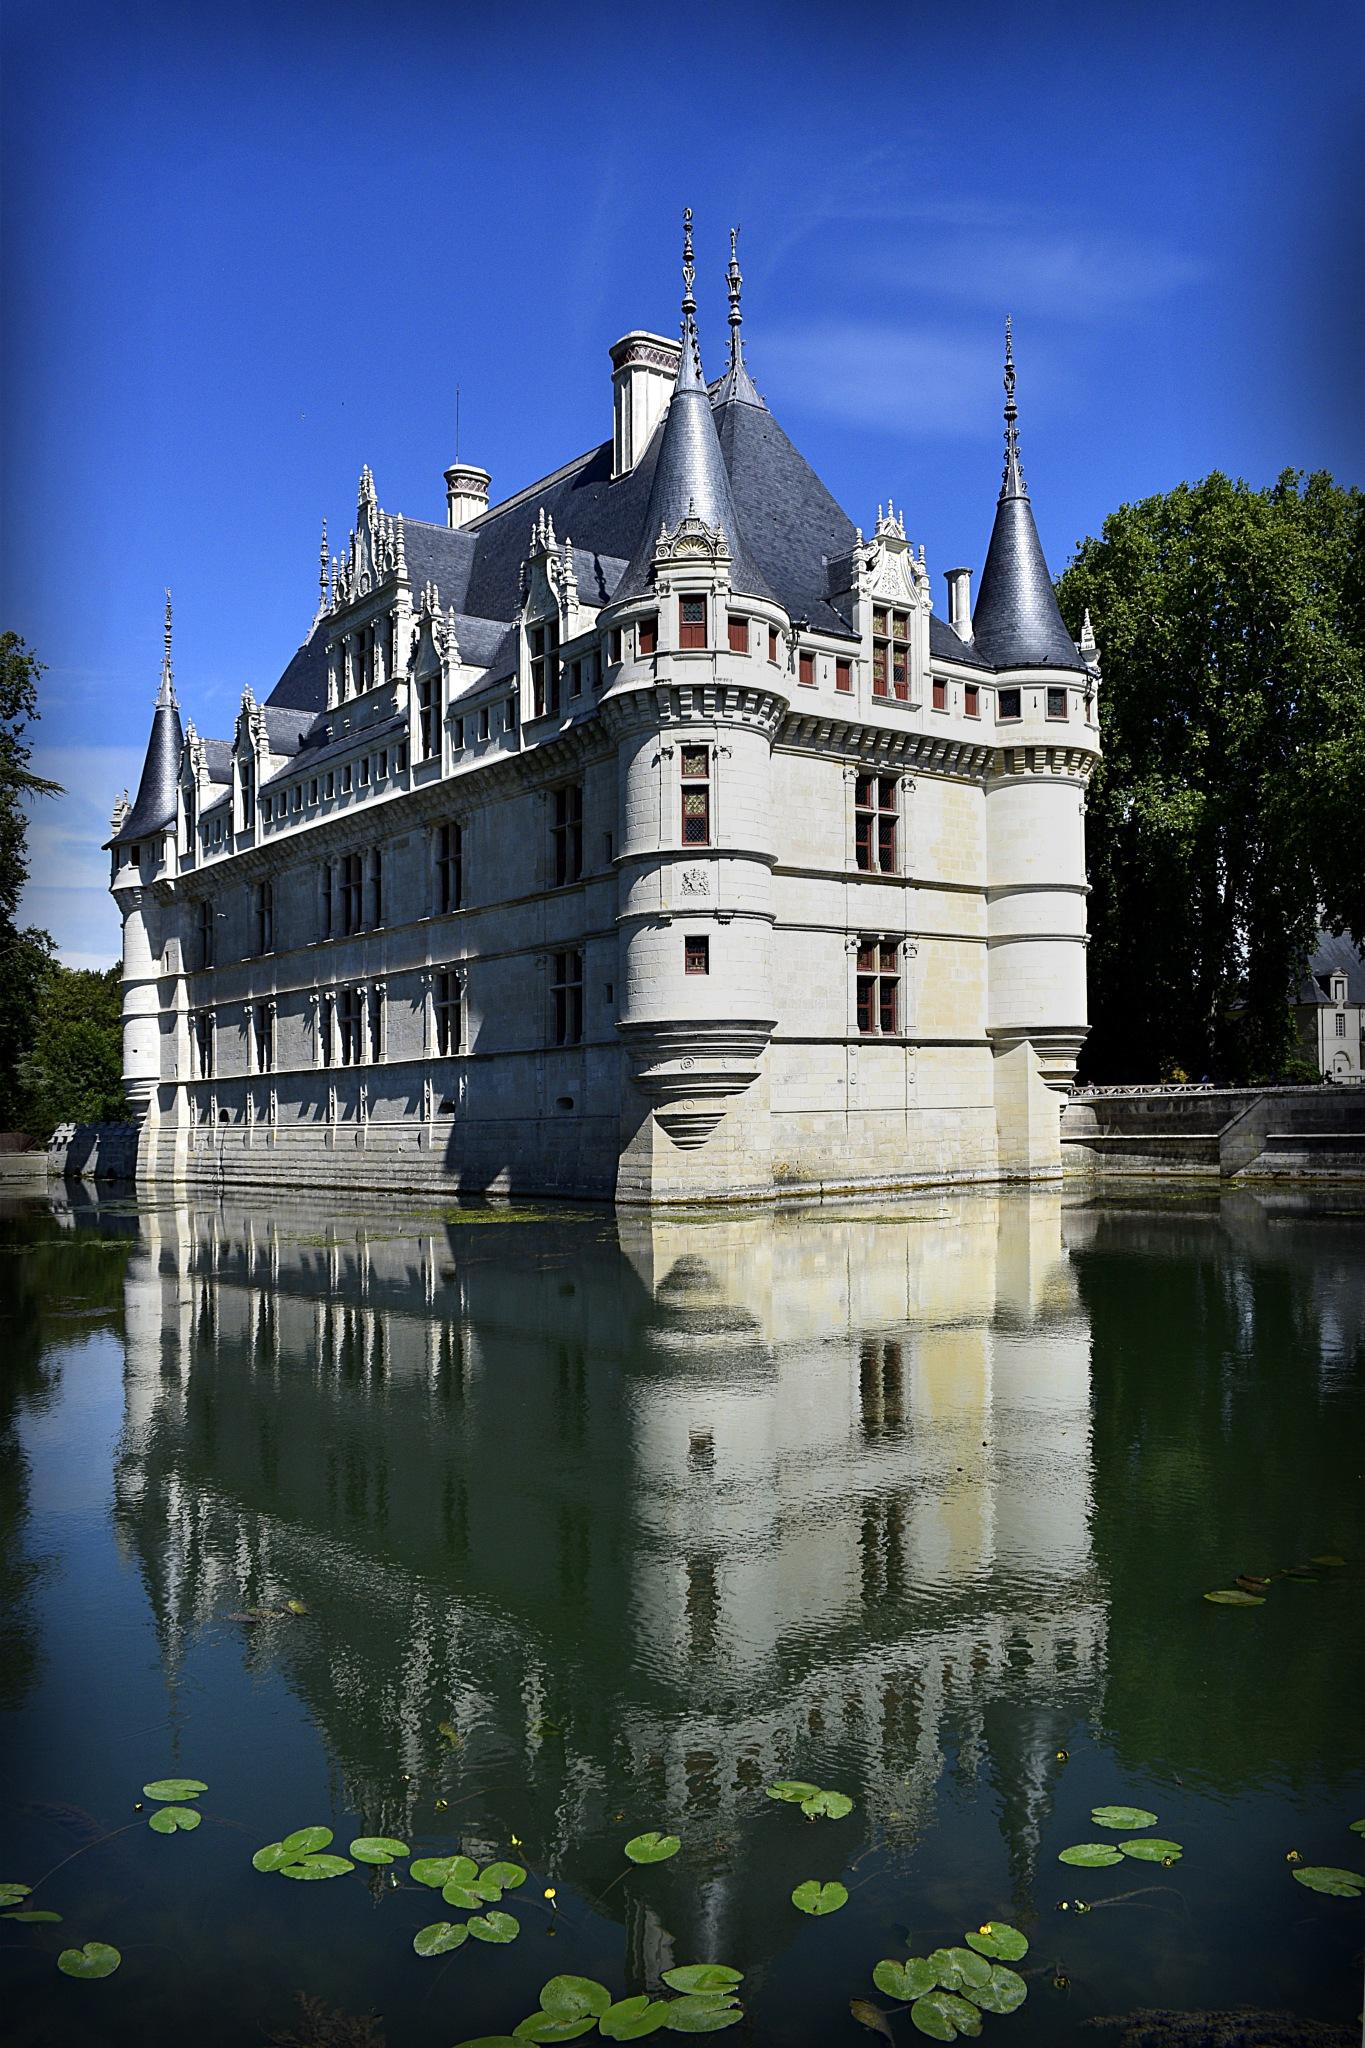 Château d'Azay-le-Rideau by Monika Swadowska